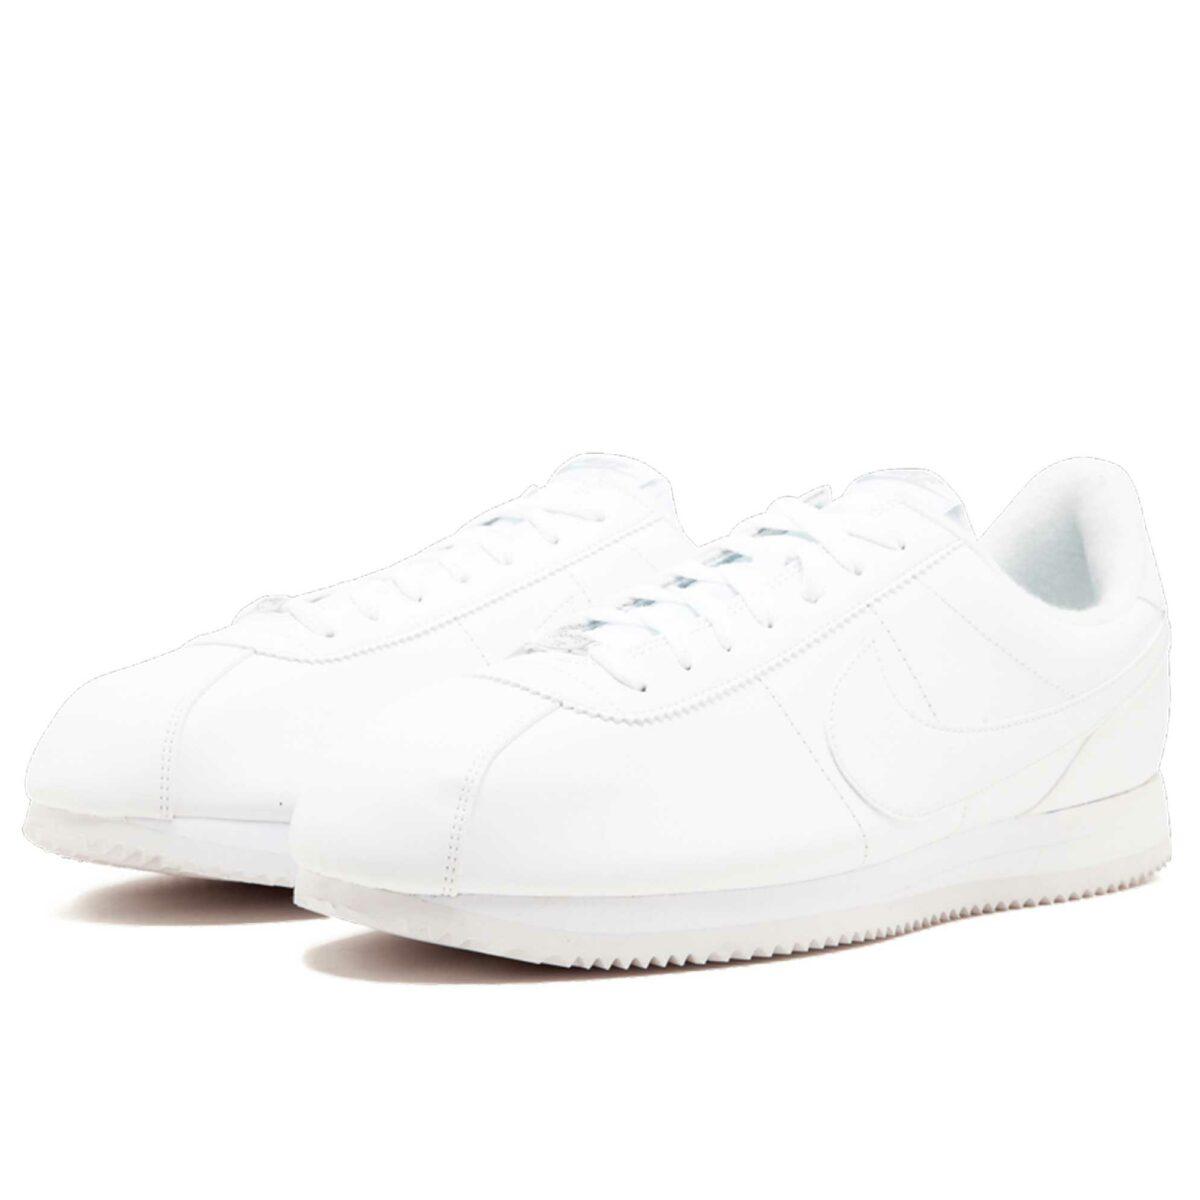 nike cortez basic leather white 819719_110 купить